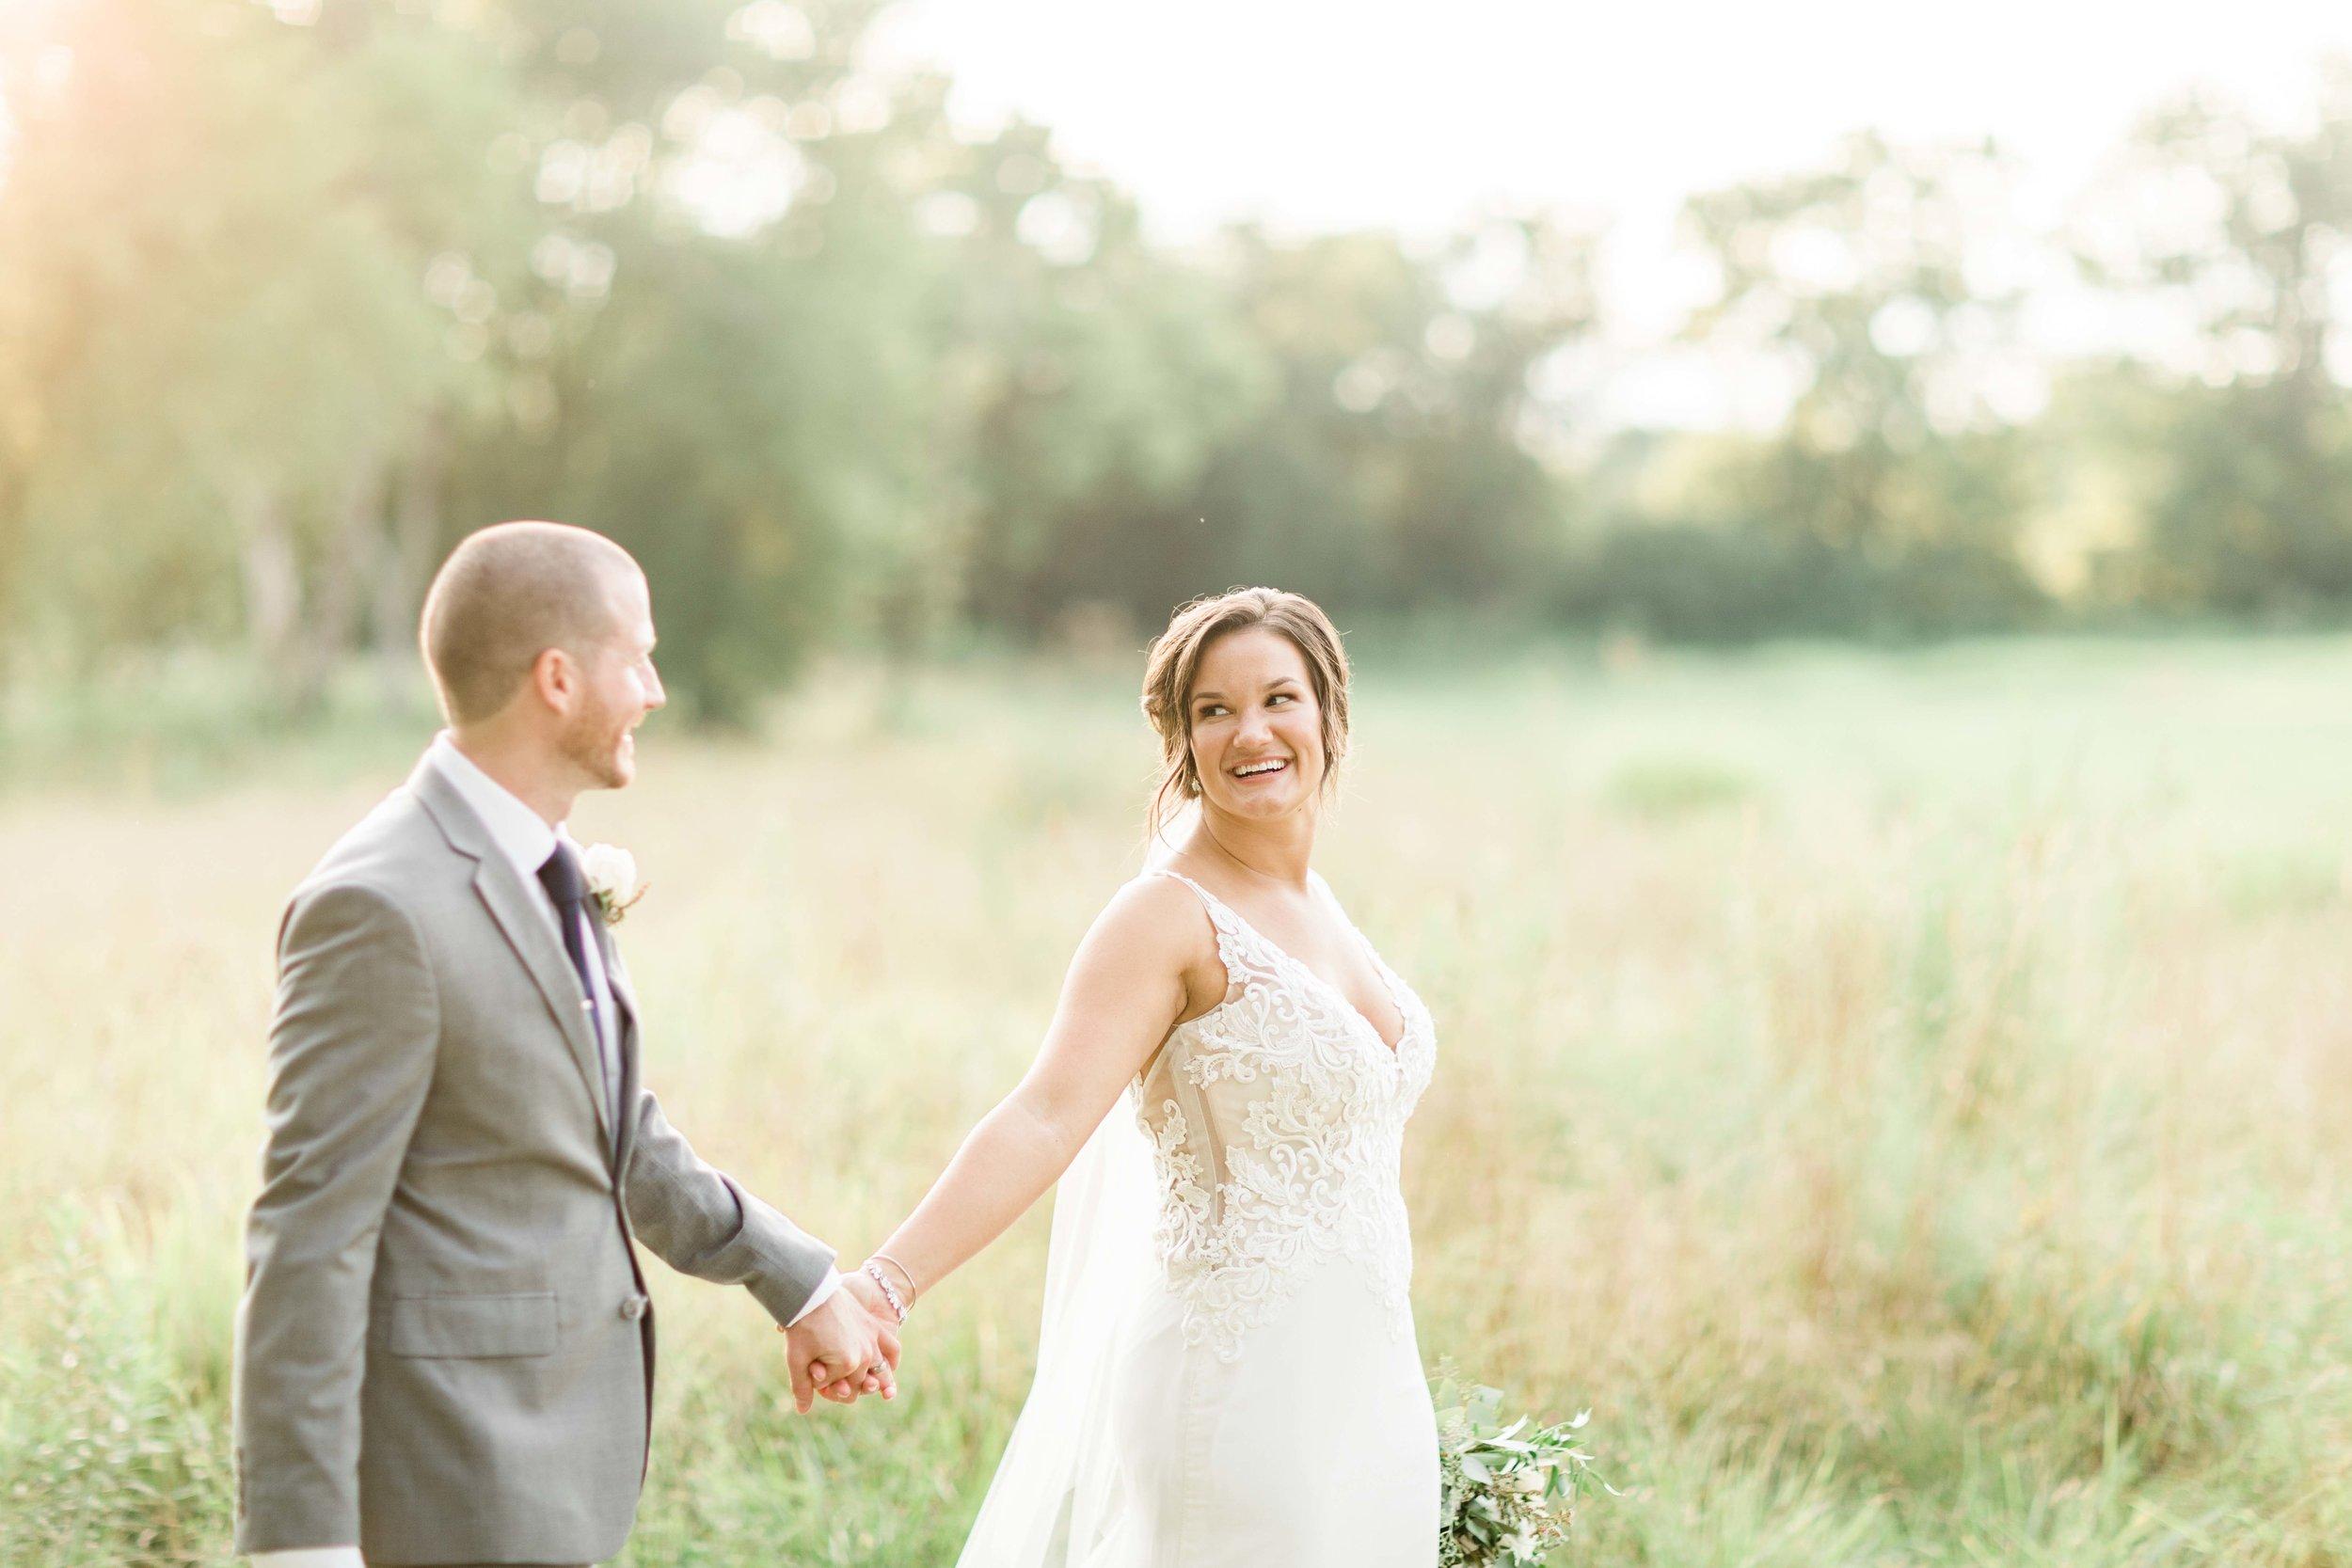 light and airy wedding photographers cincinnati ohio-8.jpg